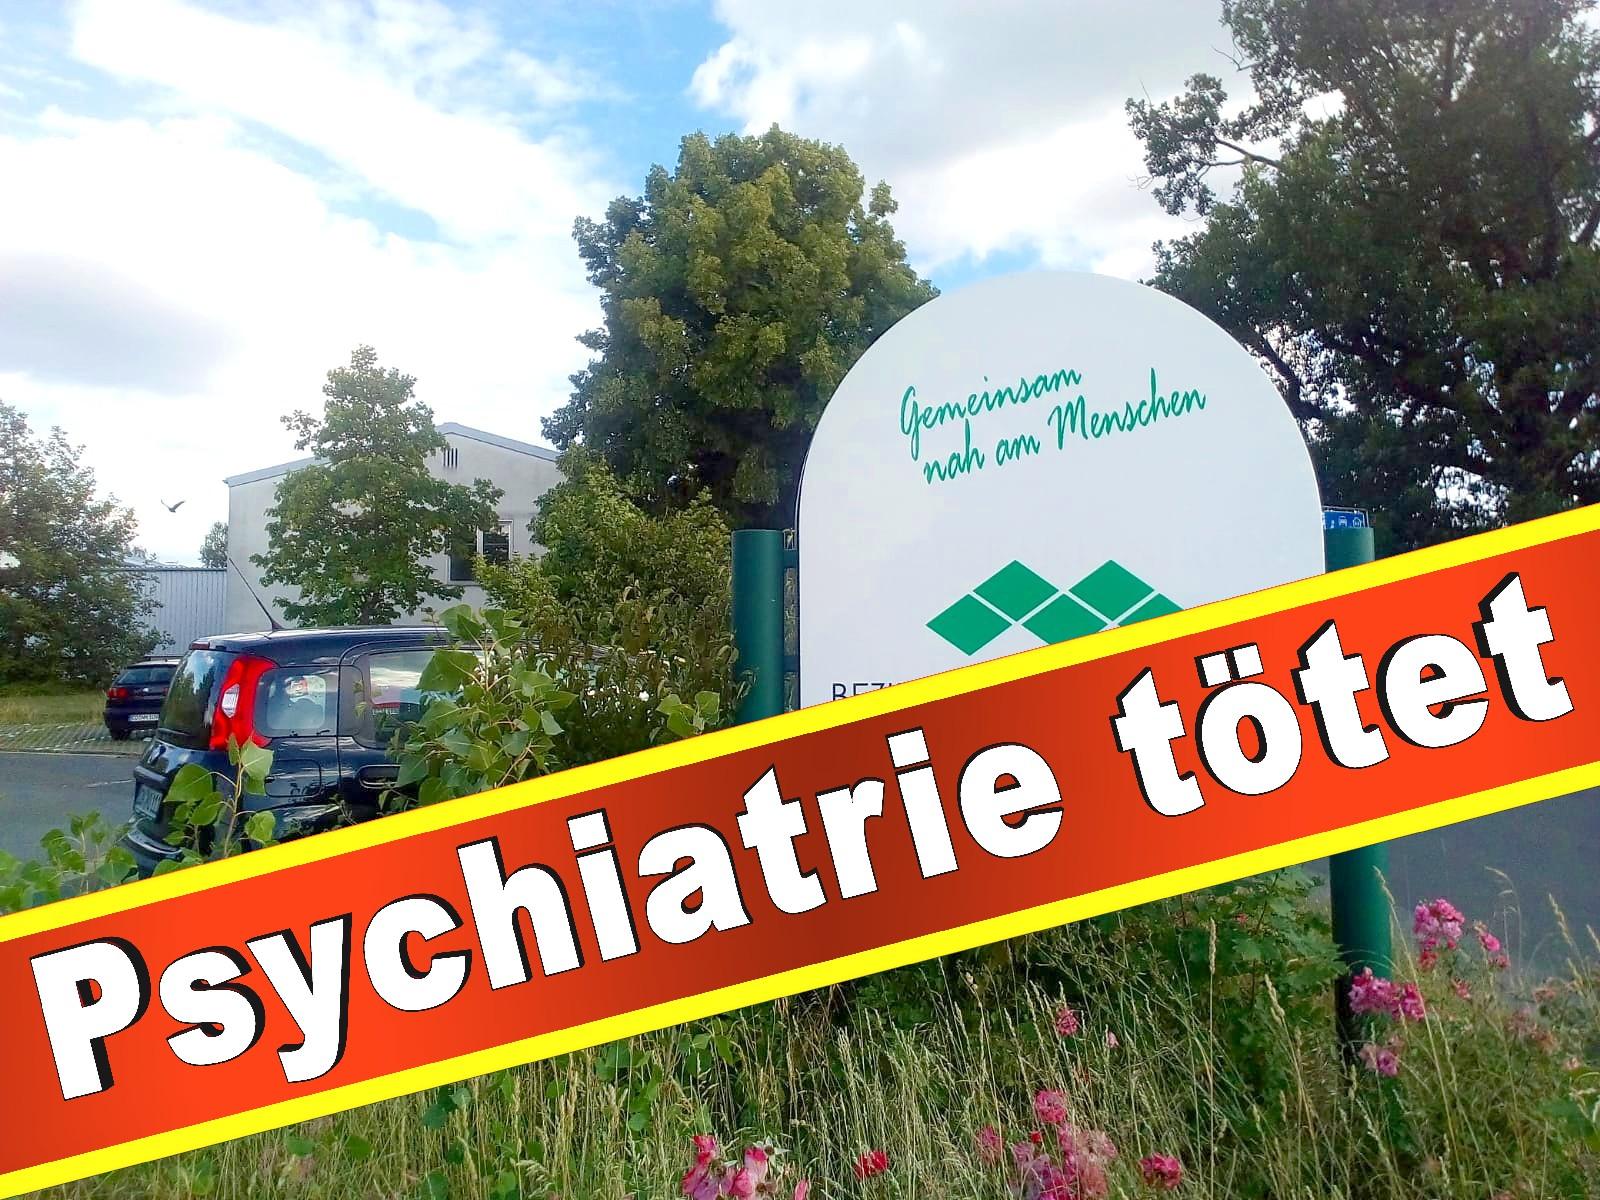 Bezirksklinikum Obermain Kutzenberg, 96250 Ebensfeld Psychiatrie Polizei Krankenhaus (11)